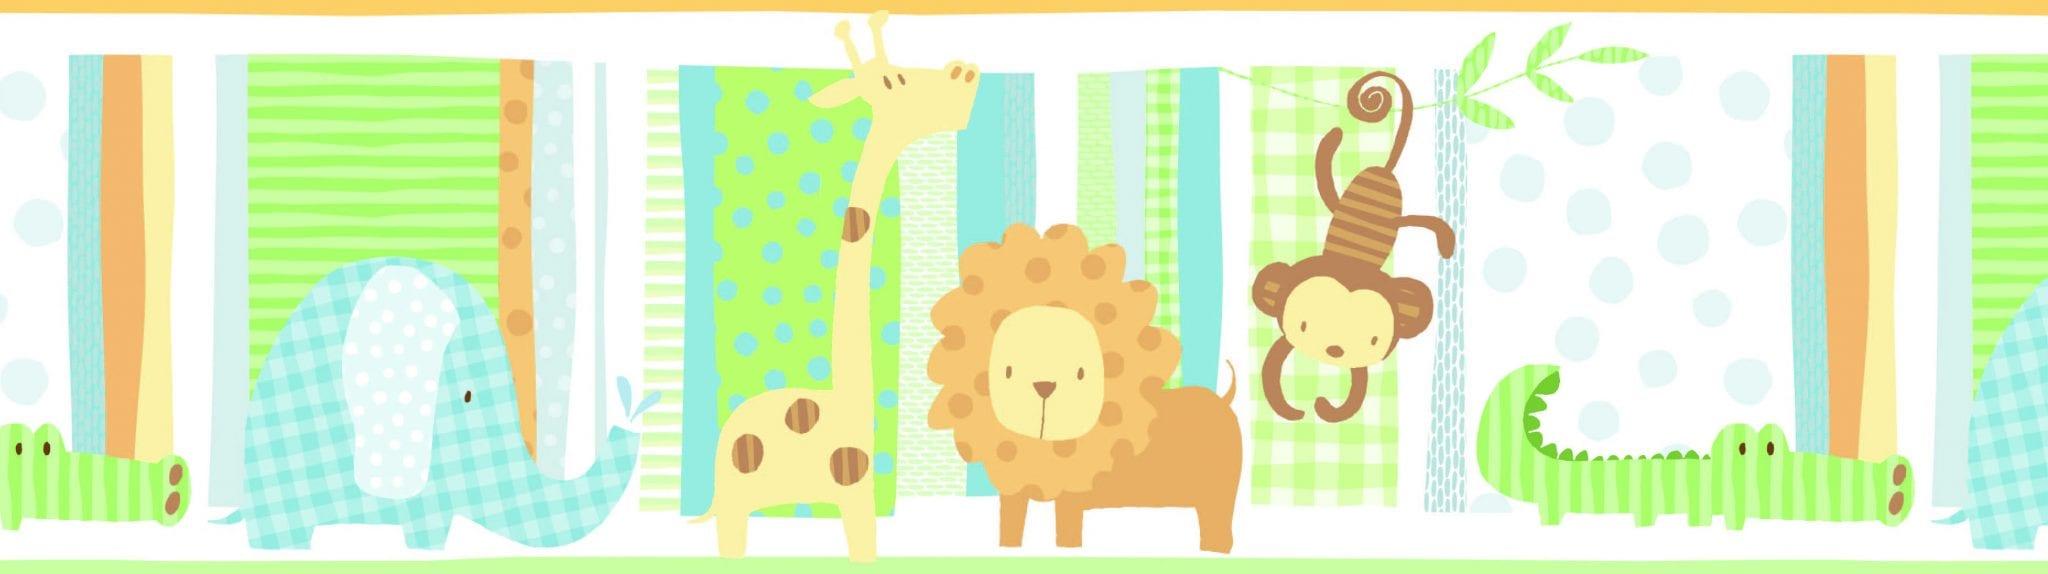 Guarda de papel infantil Animales 8755-1 Muresco